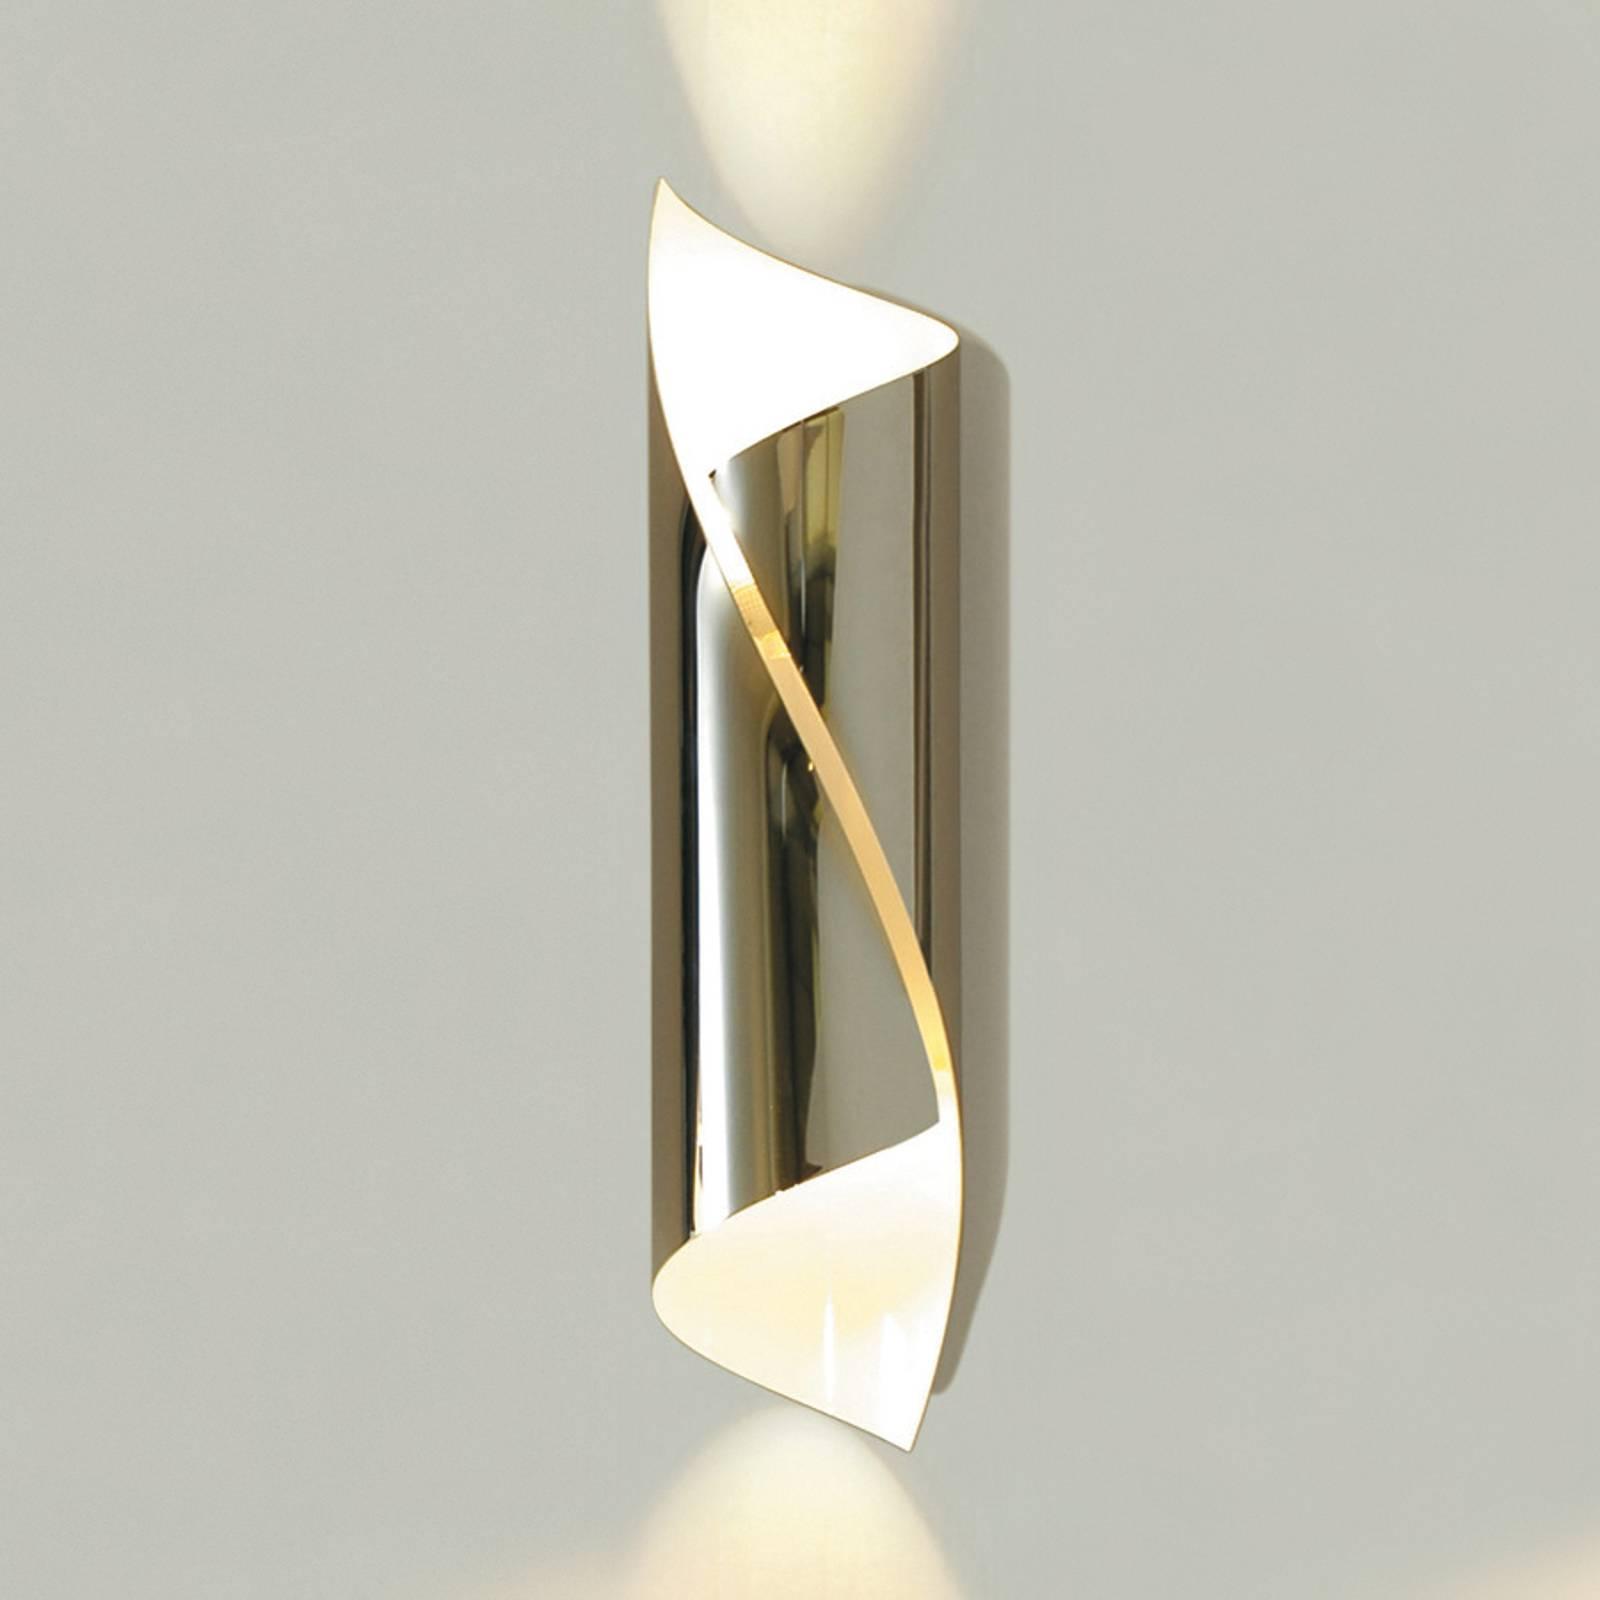 Chroomglanzende wandlamp Hué, 37 cm hoog